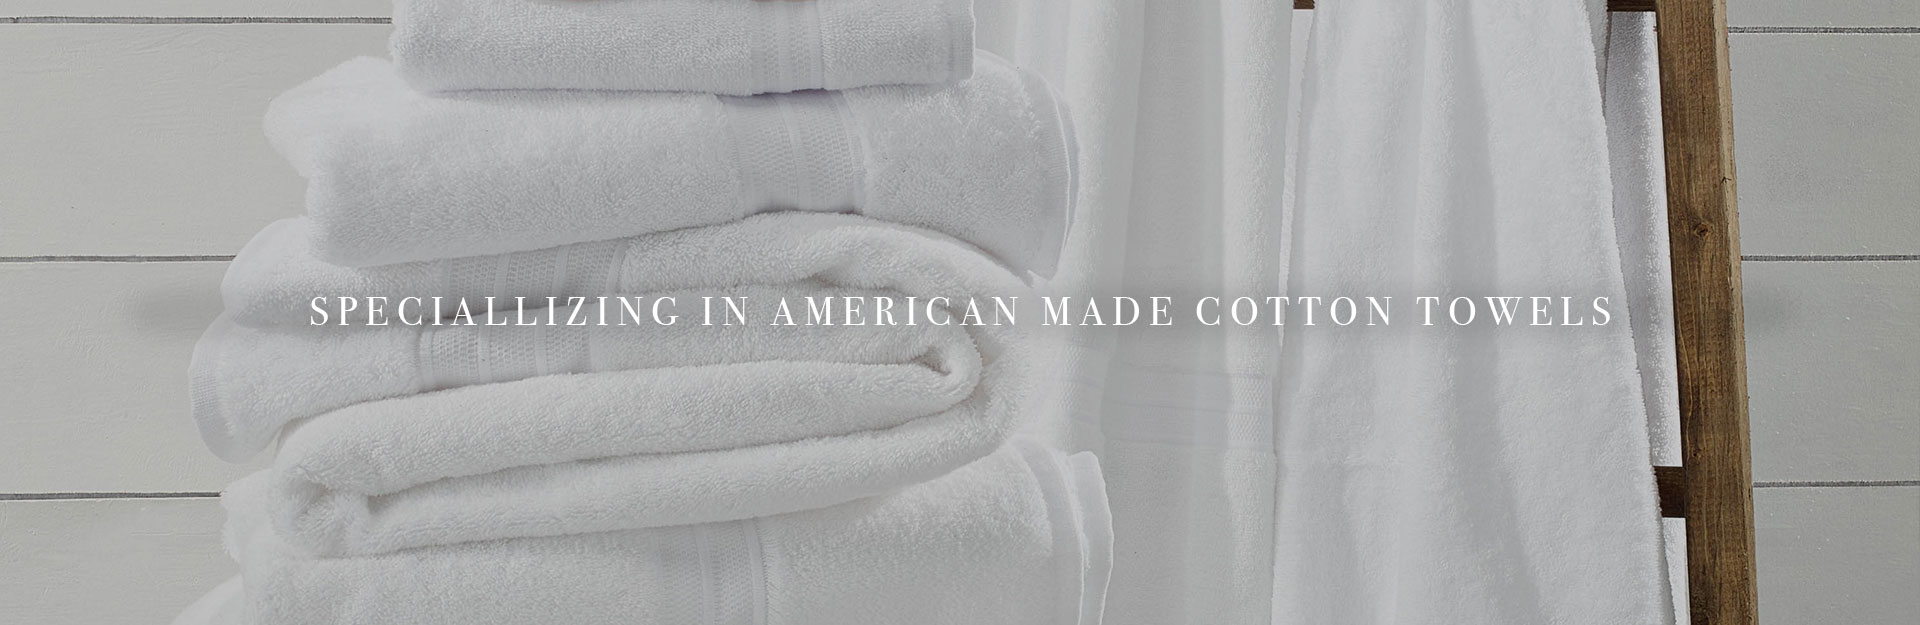 abh-towelsbanner.jpg